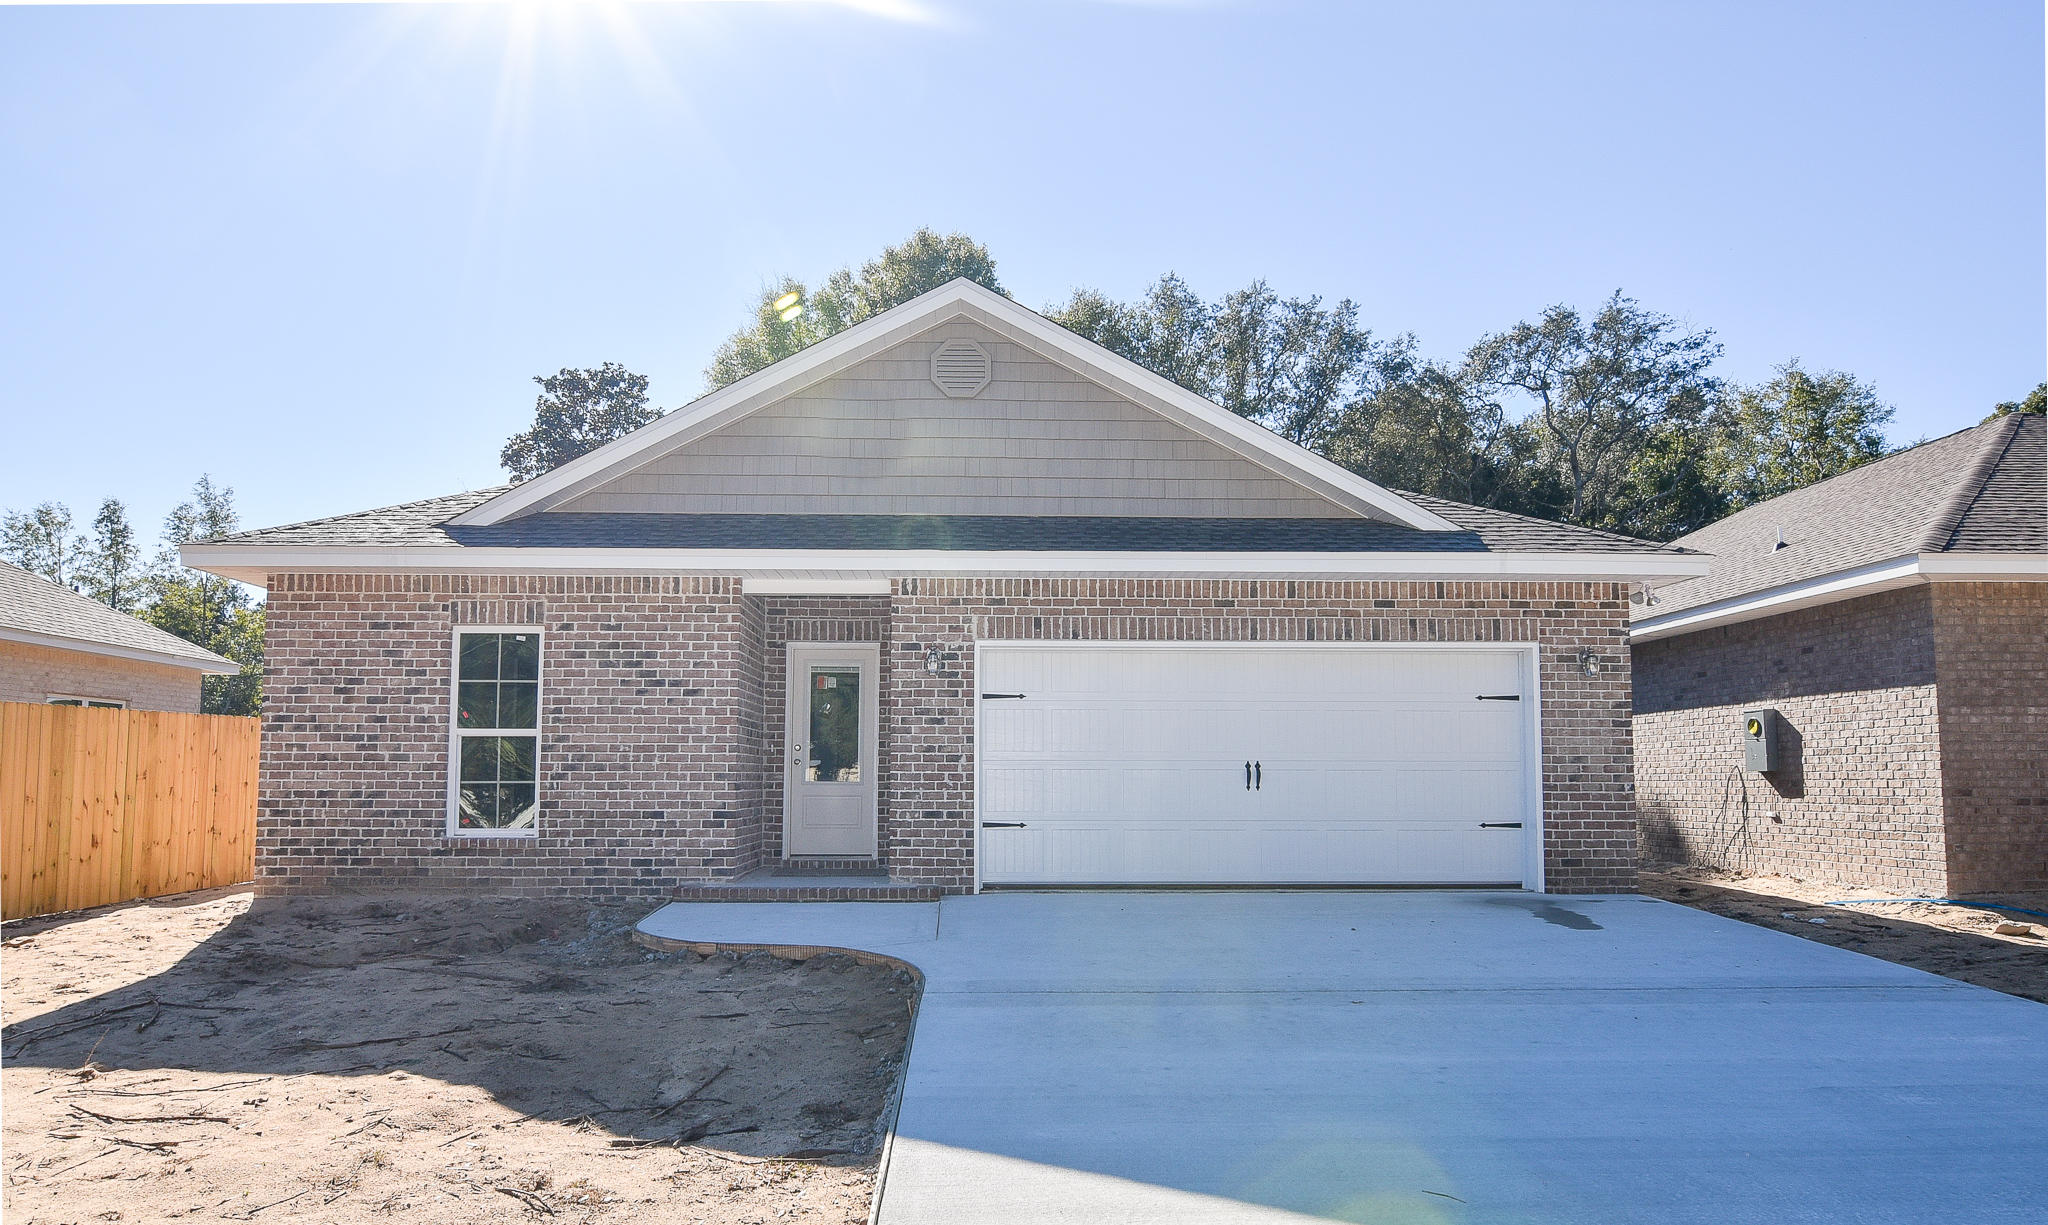 Photo of home for sale at 118 Sasser, Niceville FL